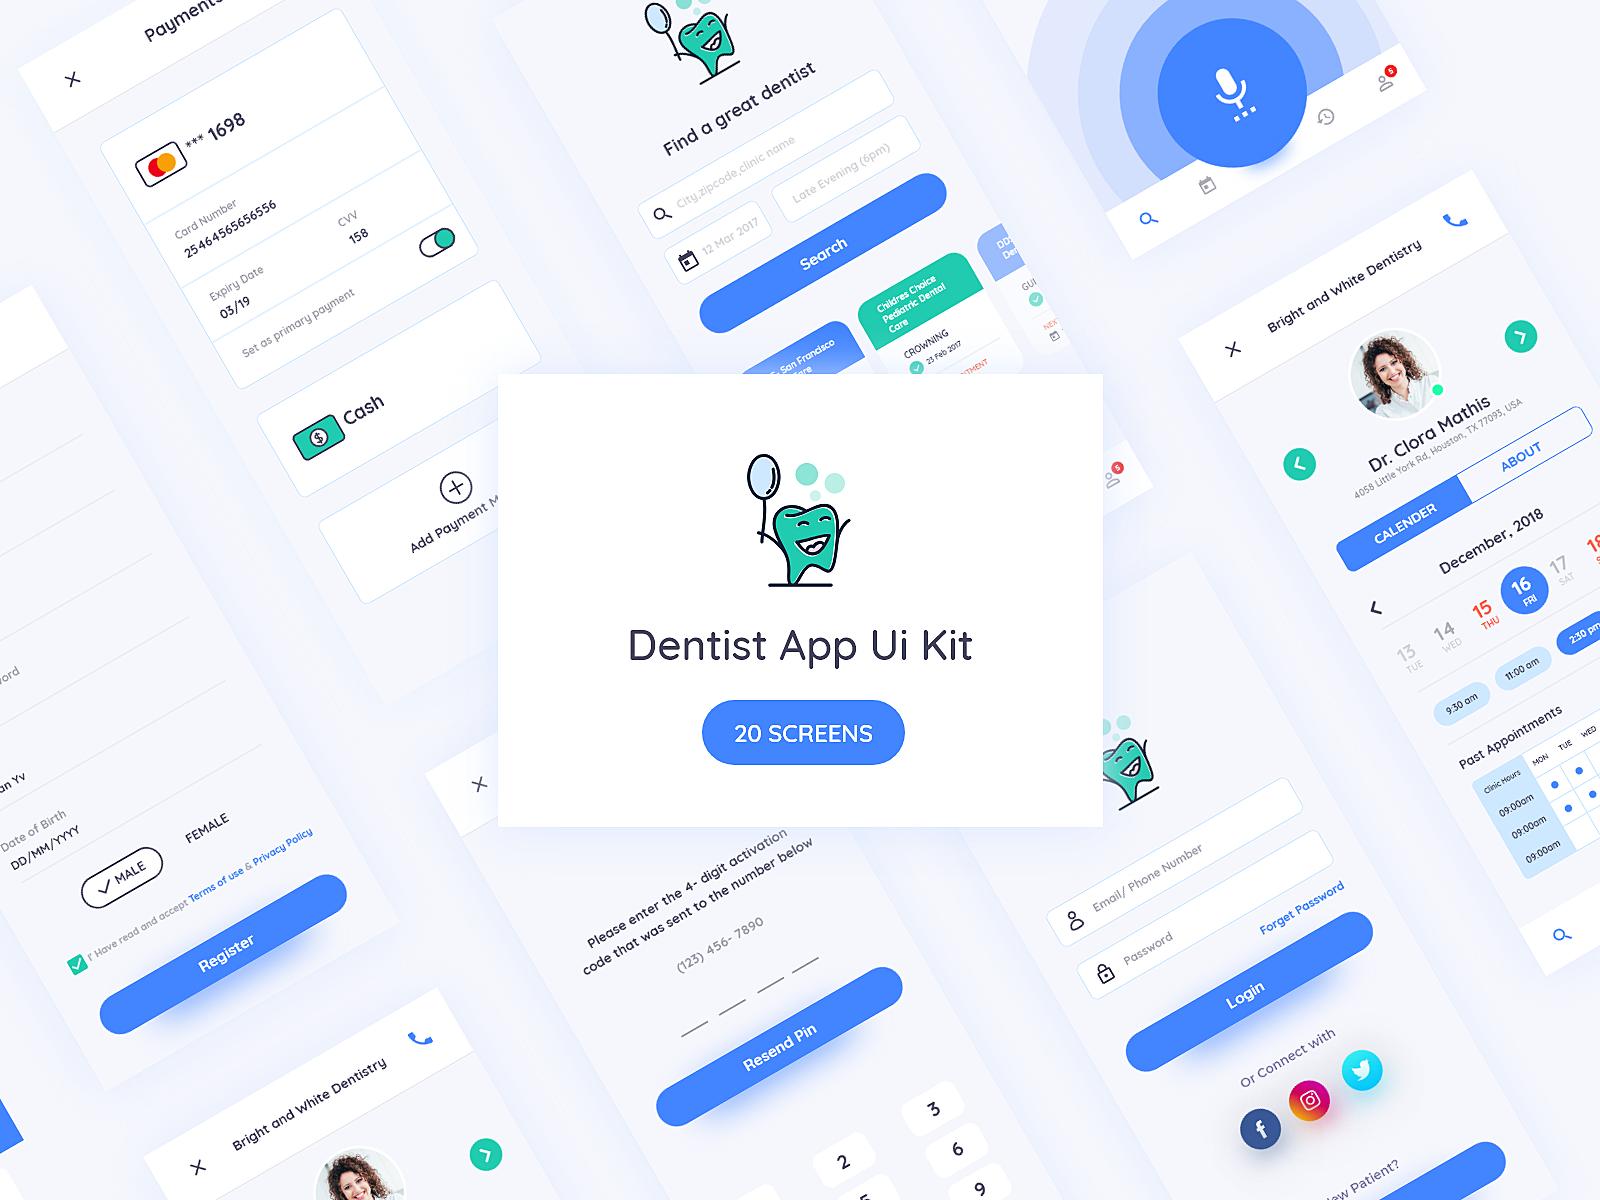 Dentist App Ui